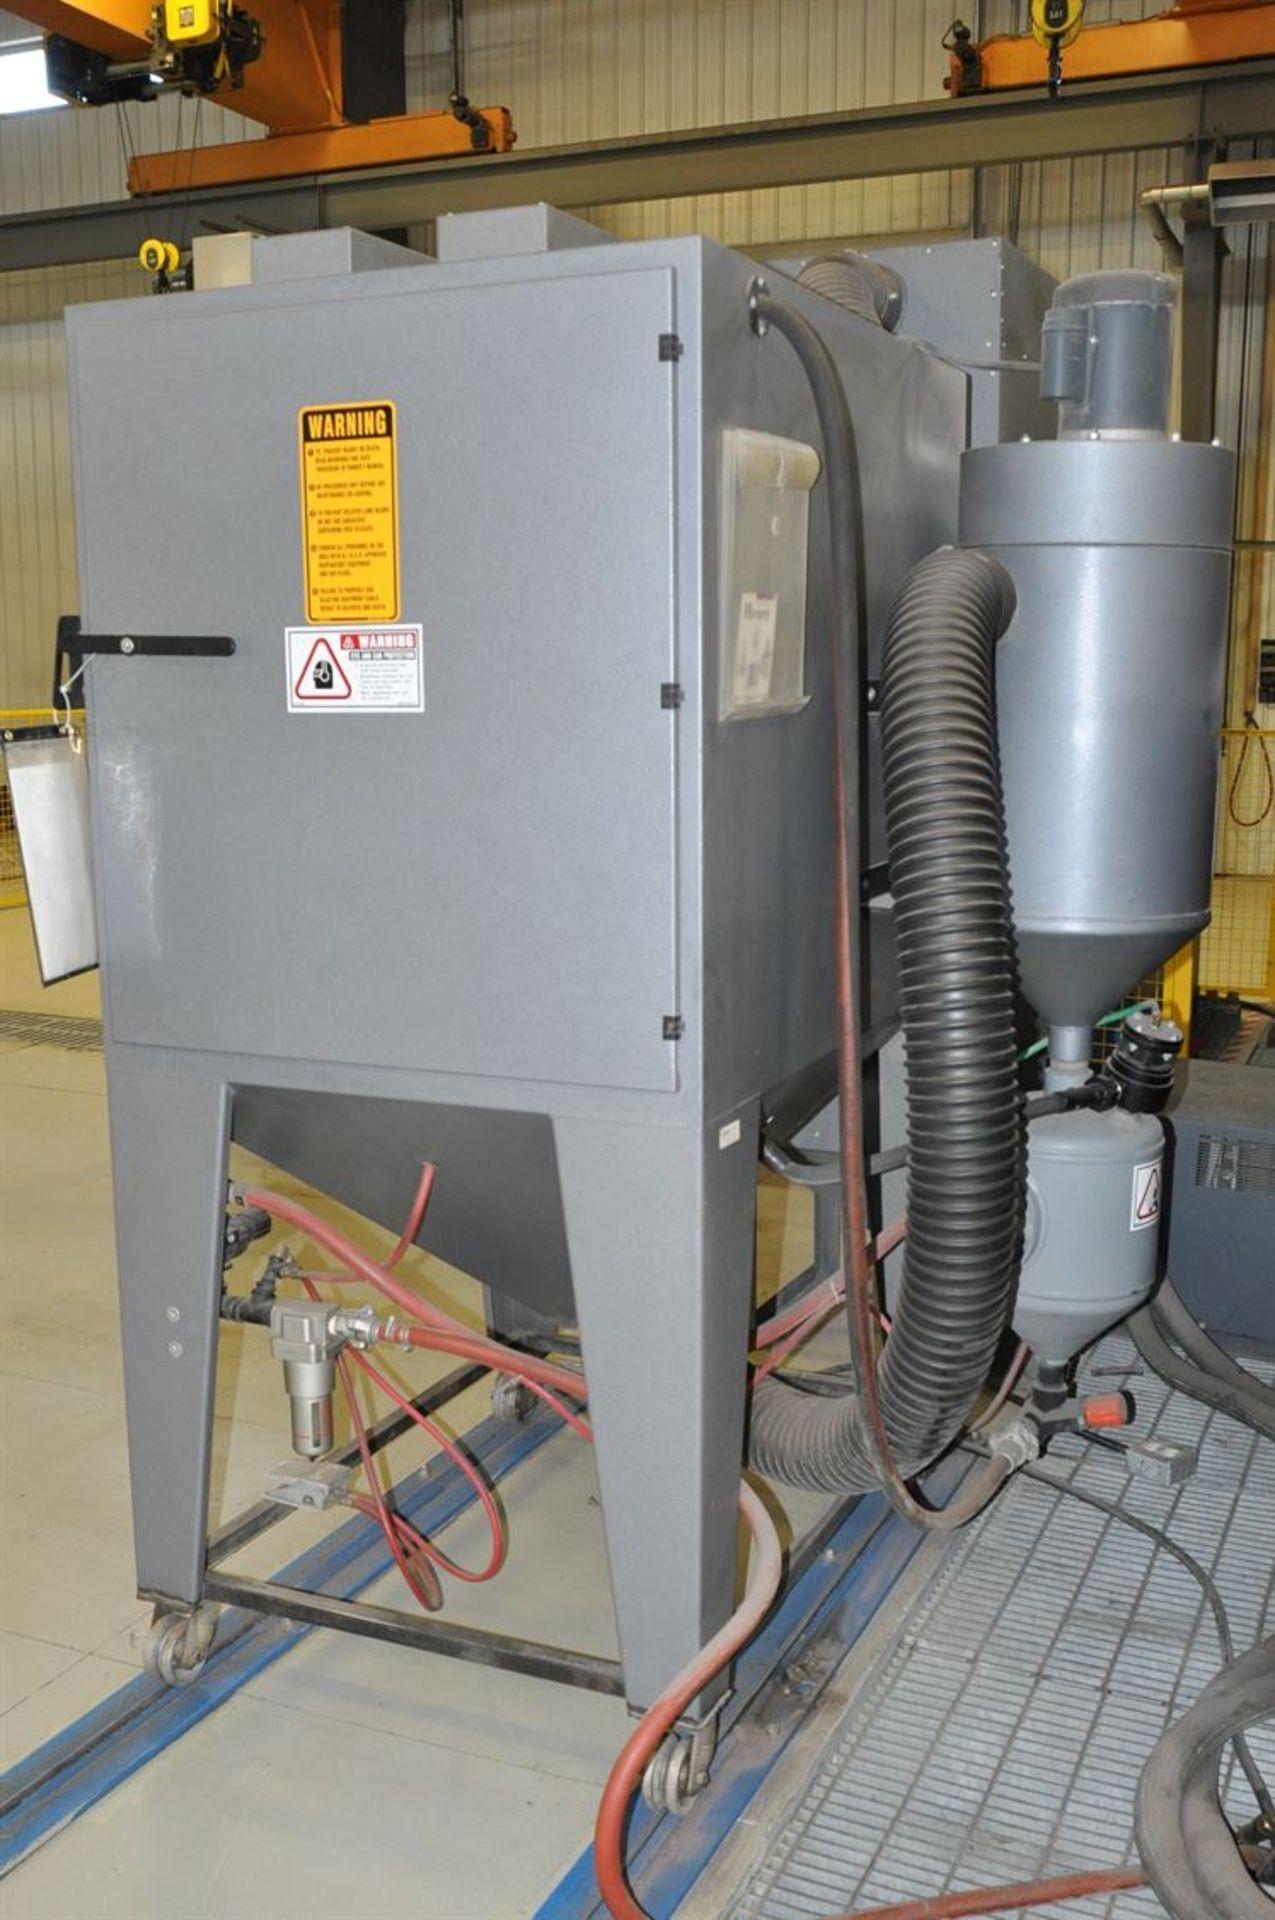 2012 MOD-U-BLAST P4836-6FM Shot Blast Cabinet, s/n 30595, w/ Dust Collector - Image 2 of 2